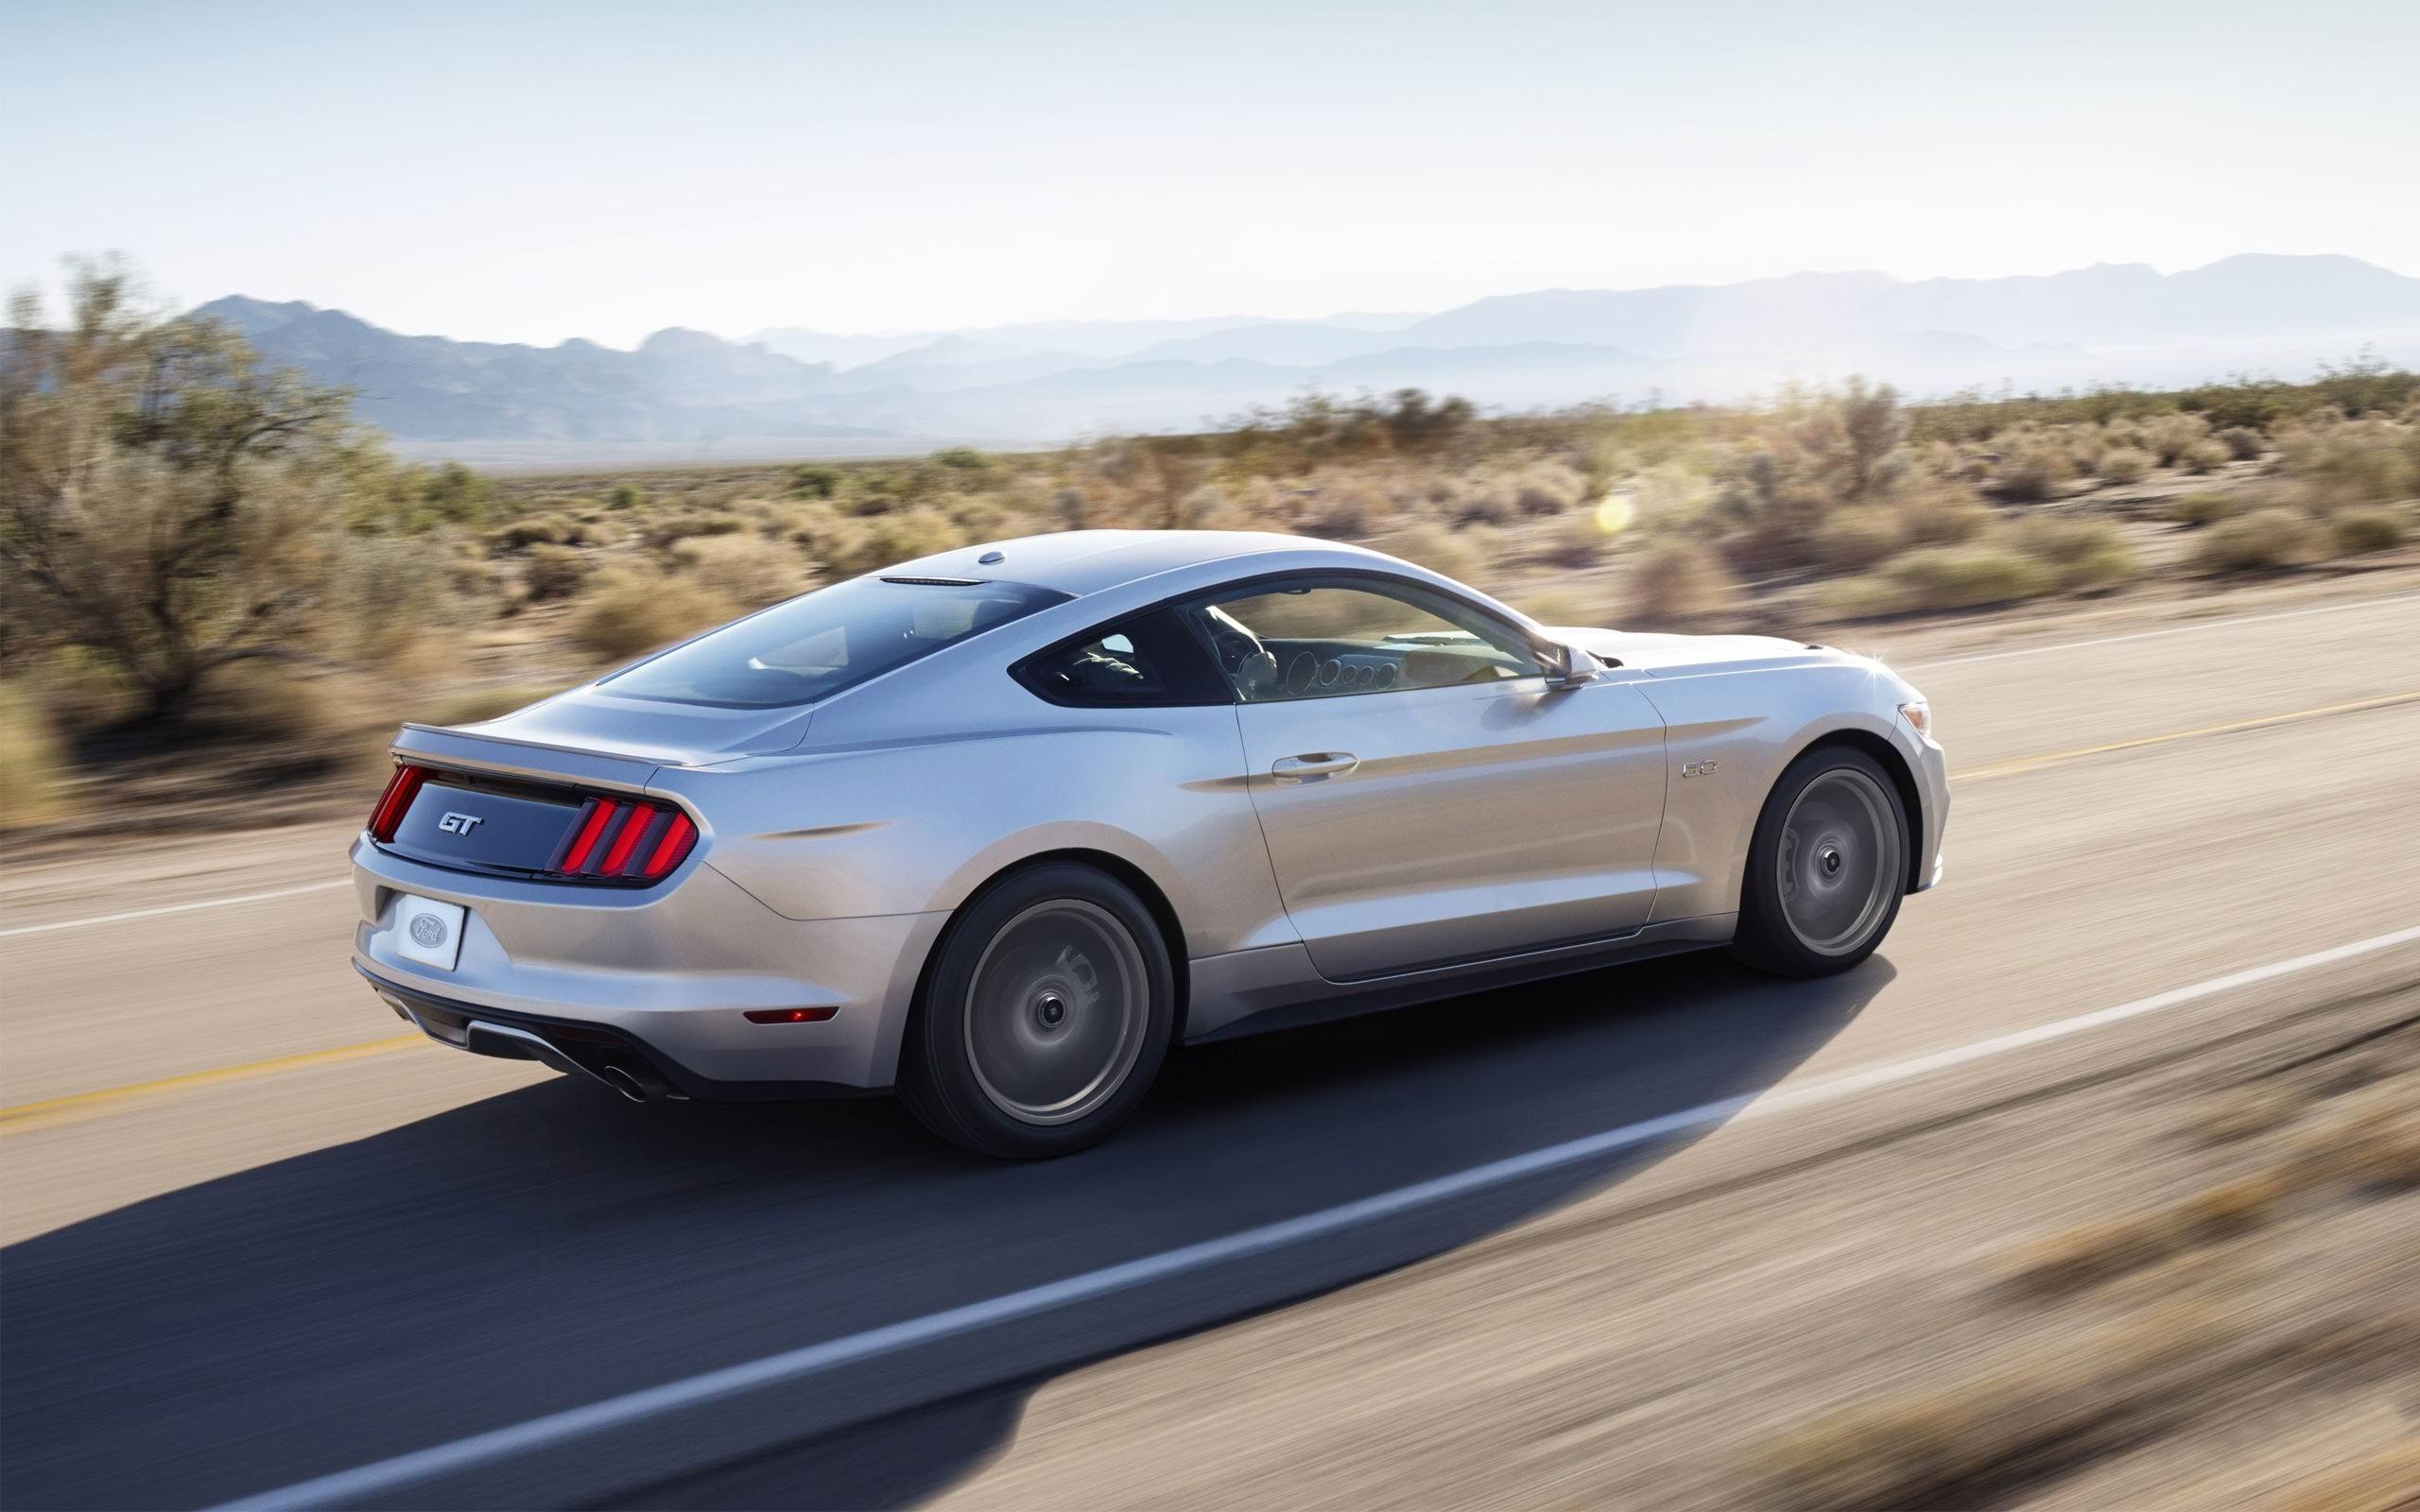 2015 Ford Mustang GT Car HD Wallpaper 04 2560x1600 2560x1600